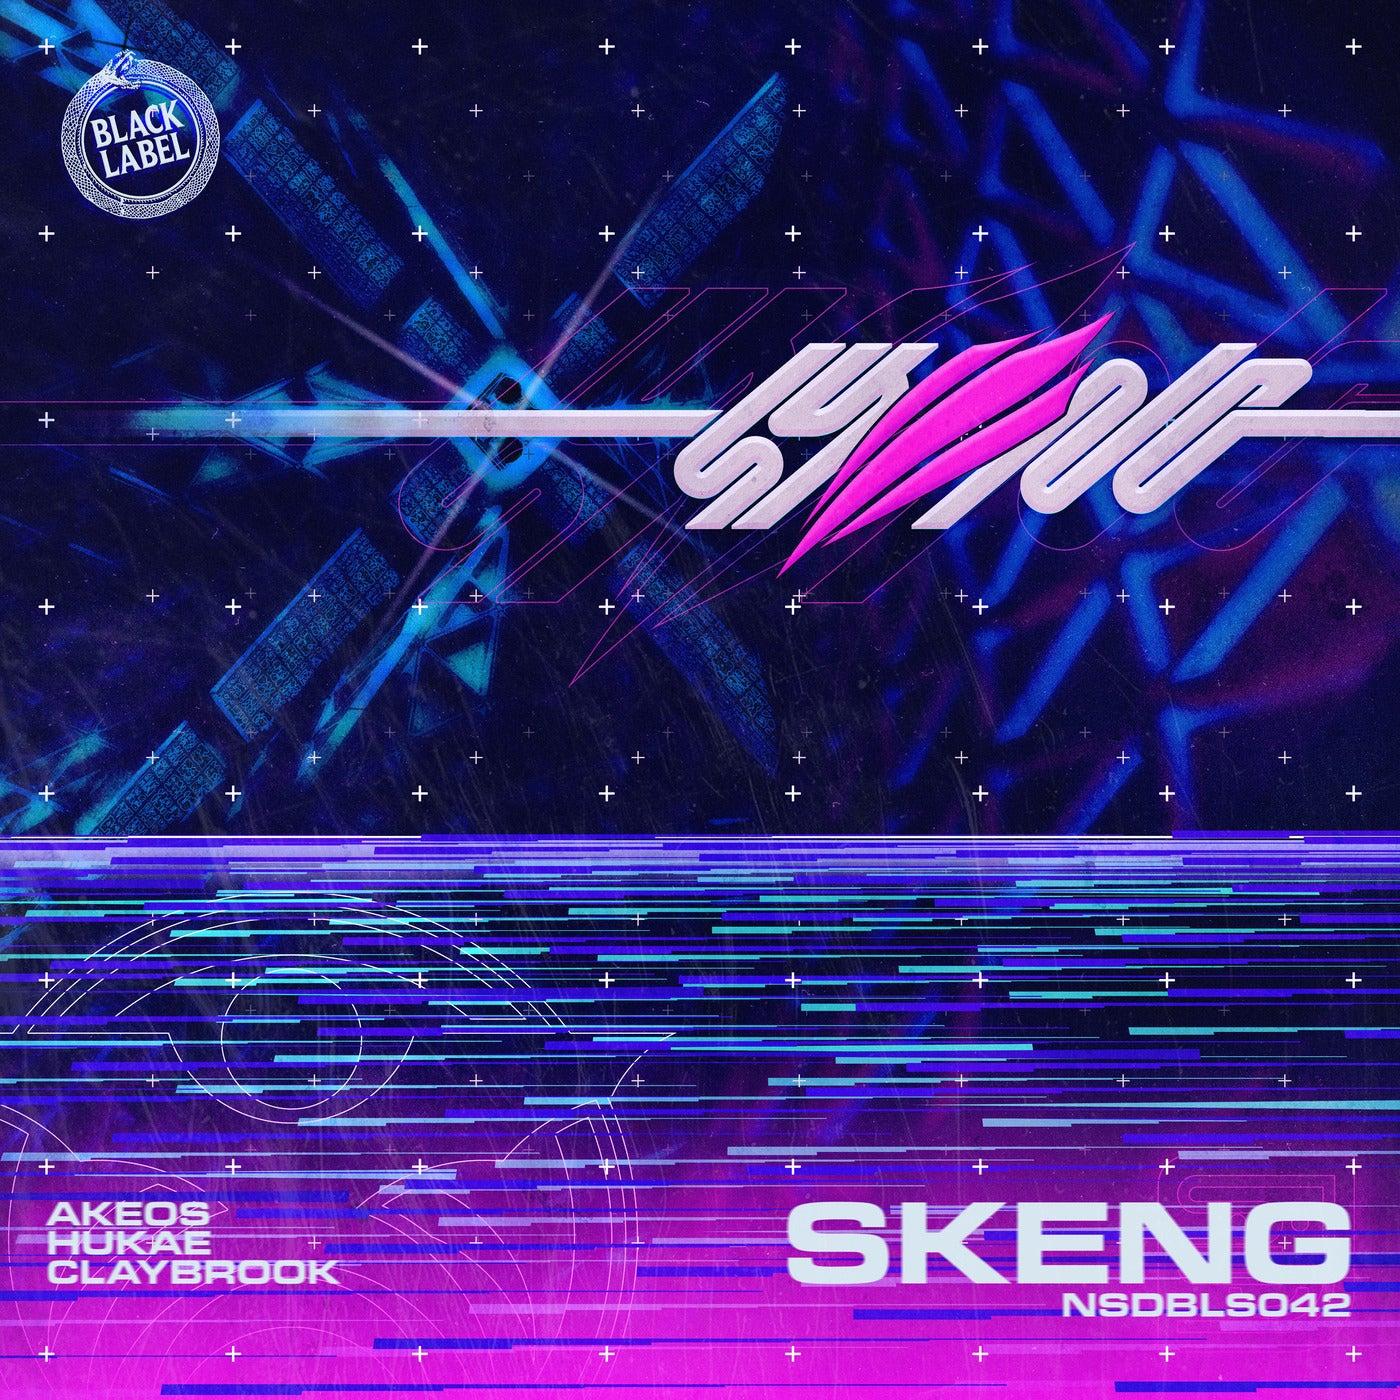 Skeng (Original Mix)